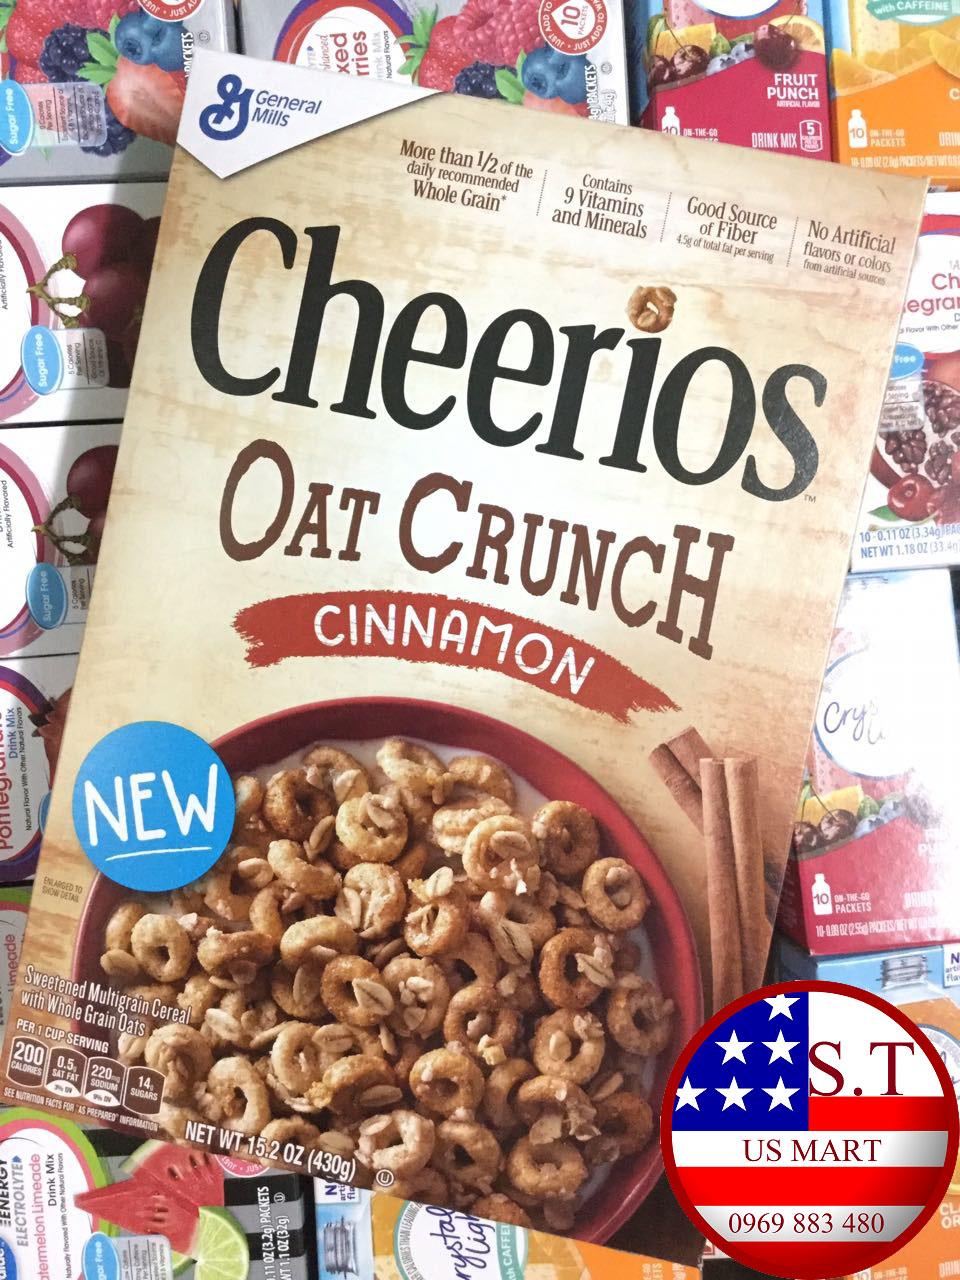 [NEW] Ngũ cốc Cheerios Oat Crunch Cinnamon 430g